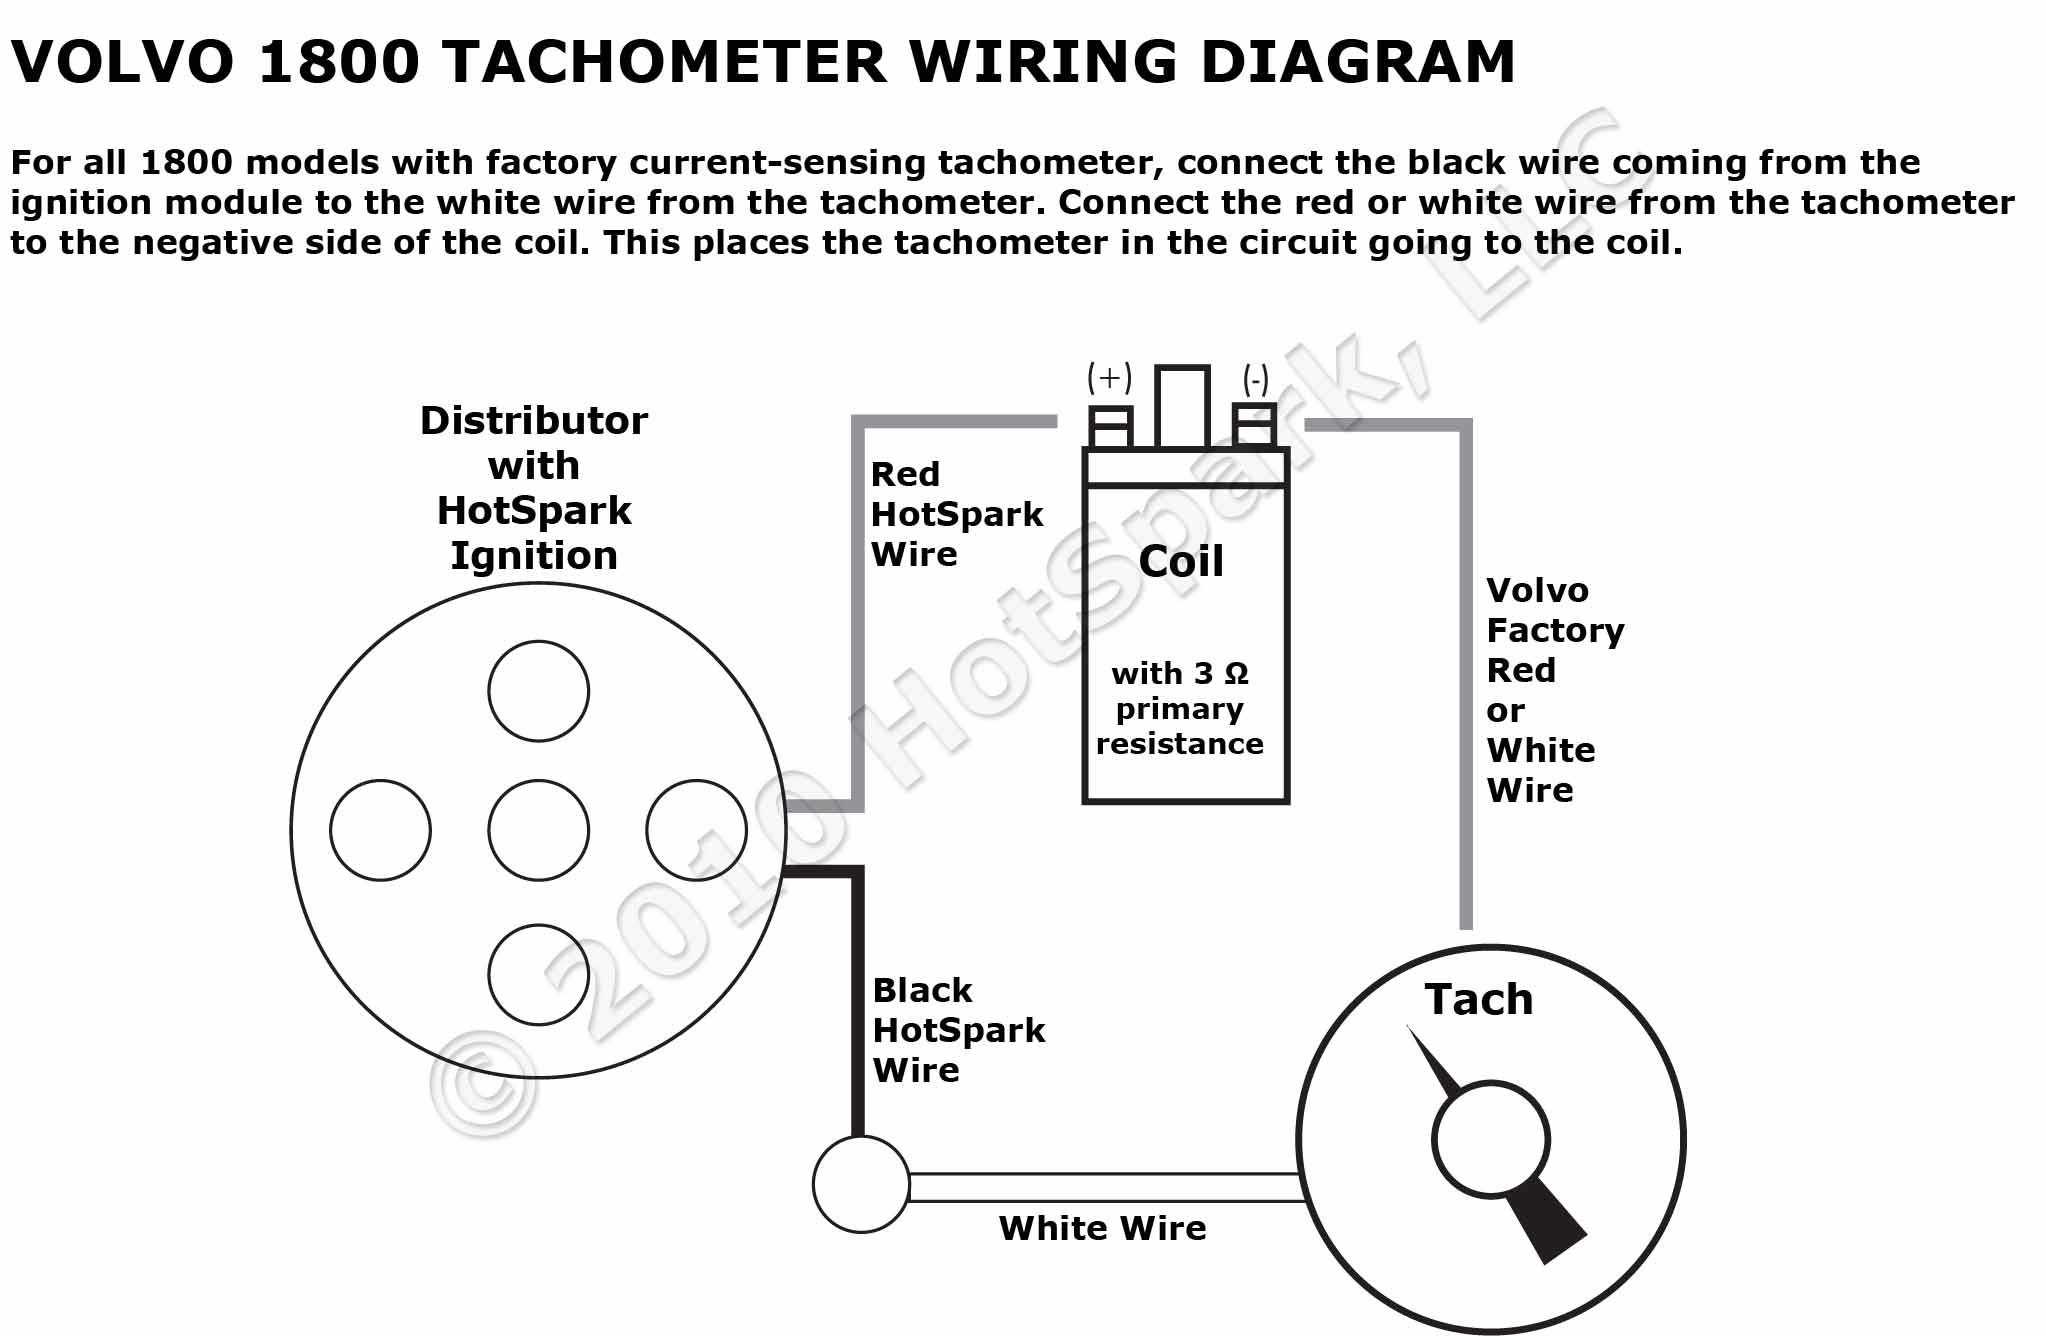 Volvo Tachometer Wiring - Wiring Diagrams Hubs - Tachometer Wiring Diagram